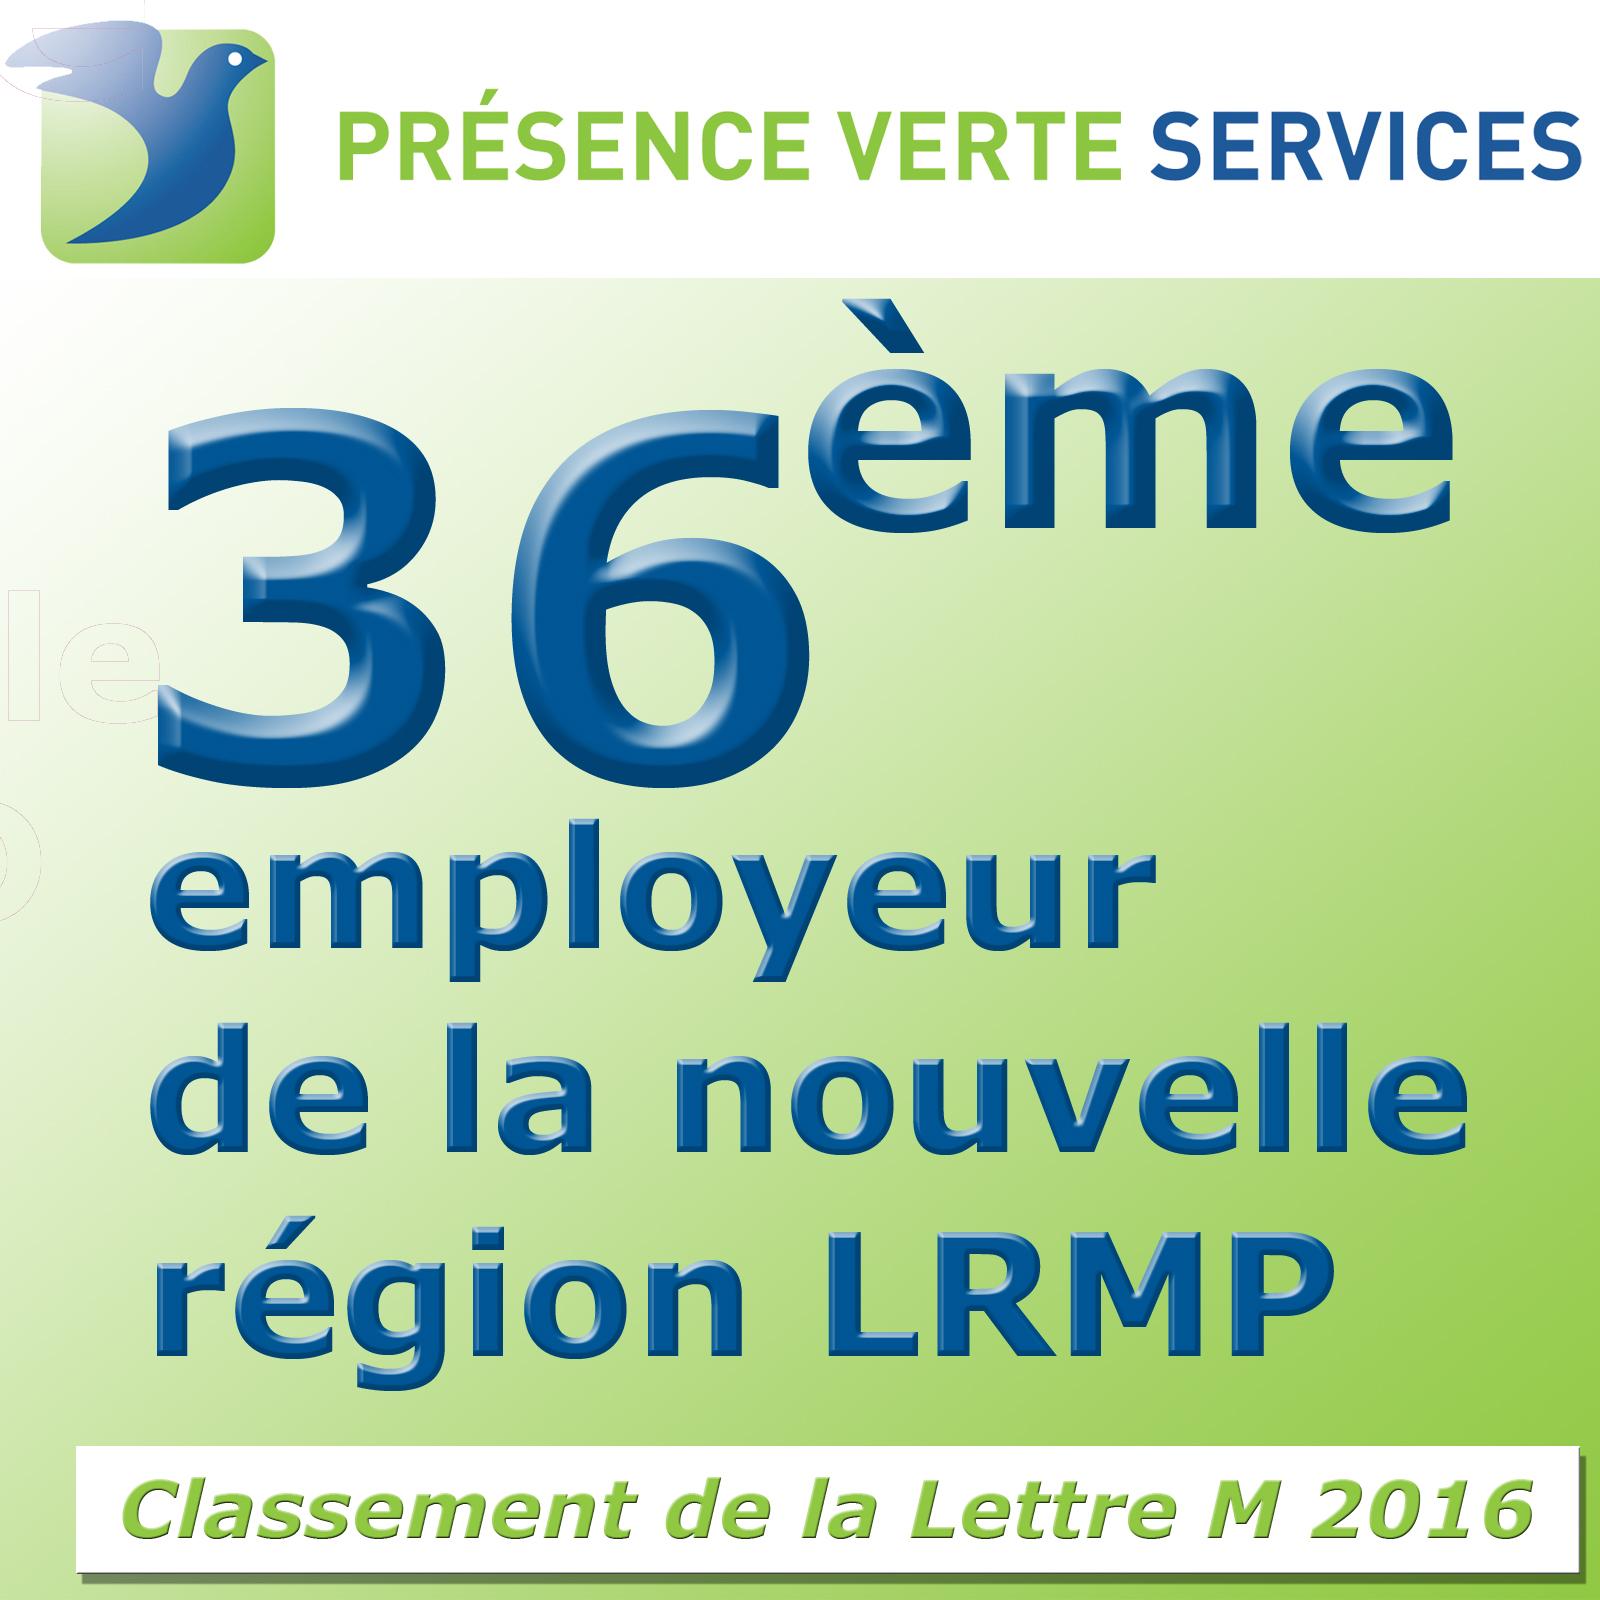 Classement employeur LRMP